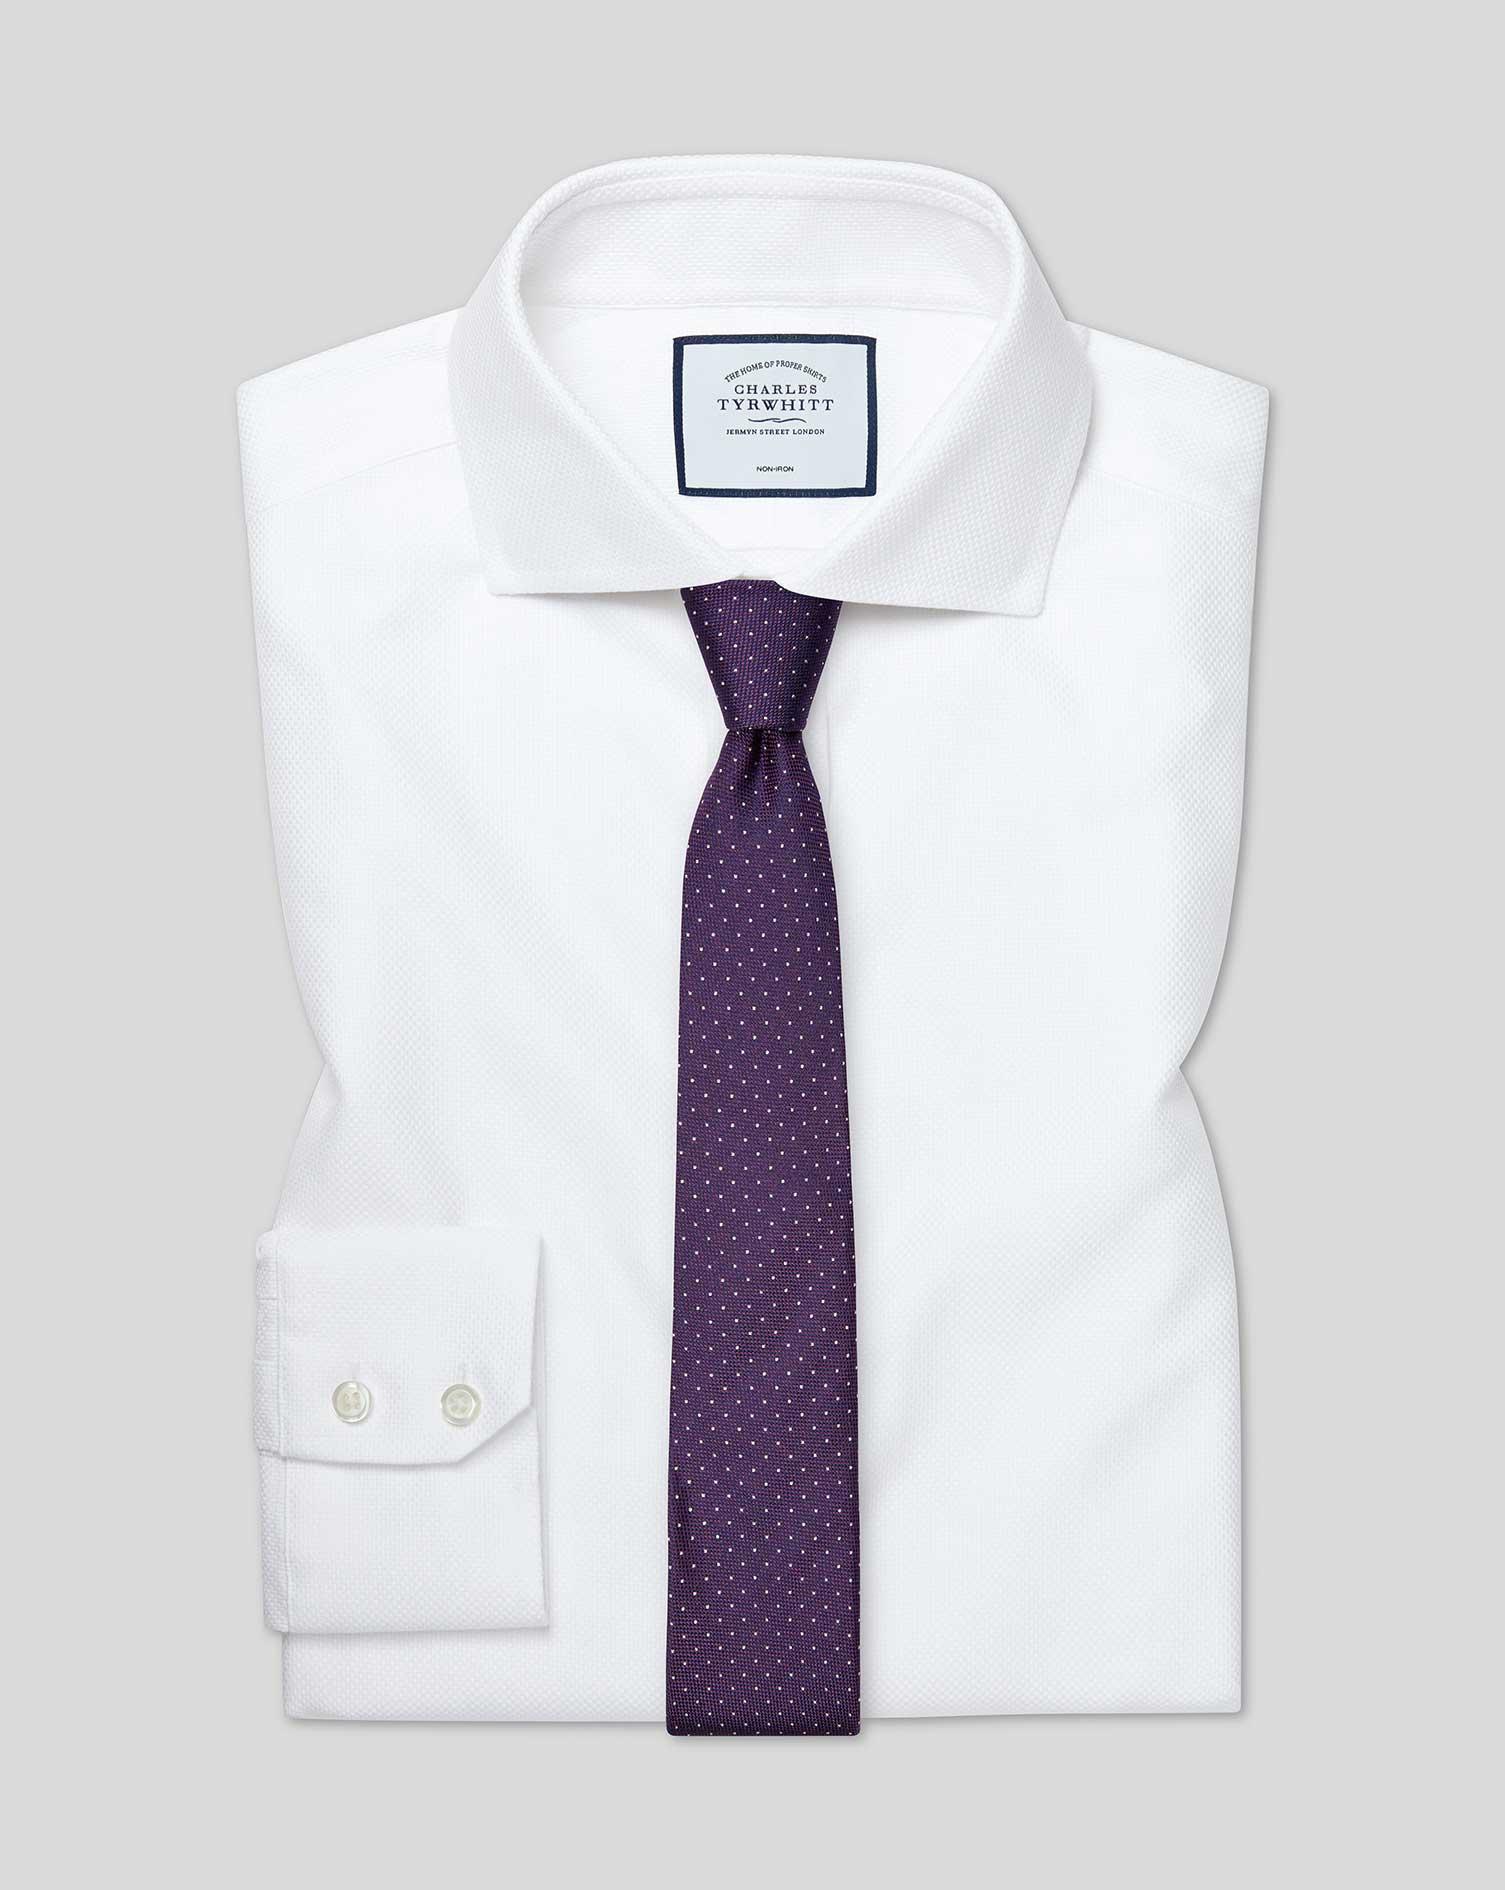 Cotton Extra Slim Fit Cutaway Non-Iron Buckingham Weave White Shirt